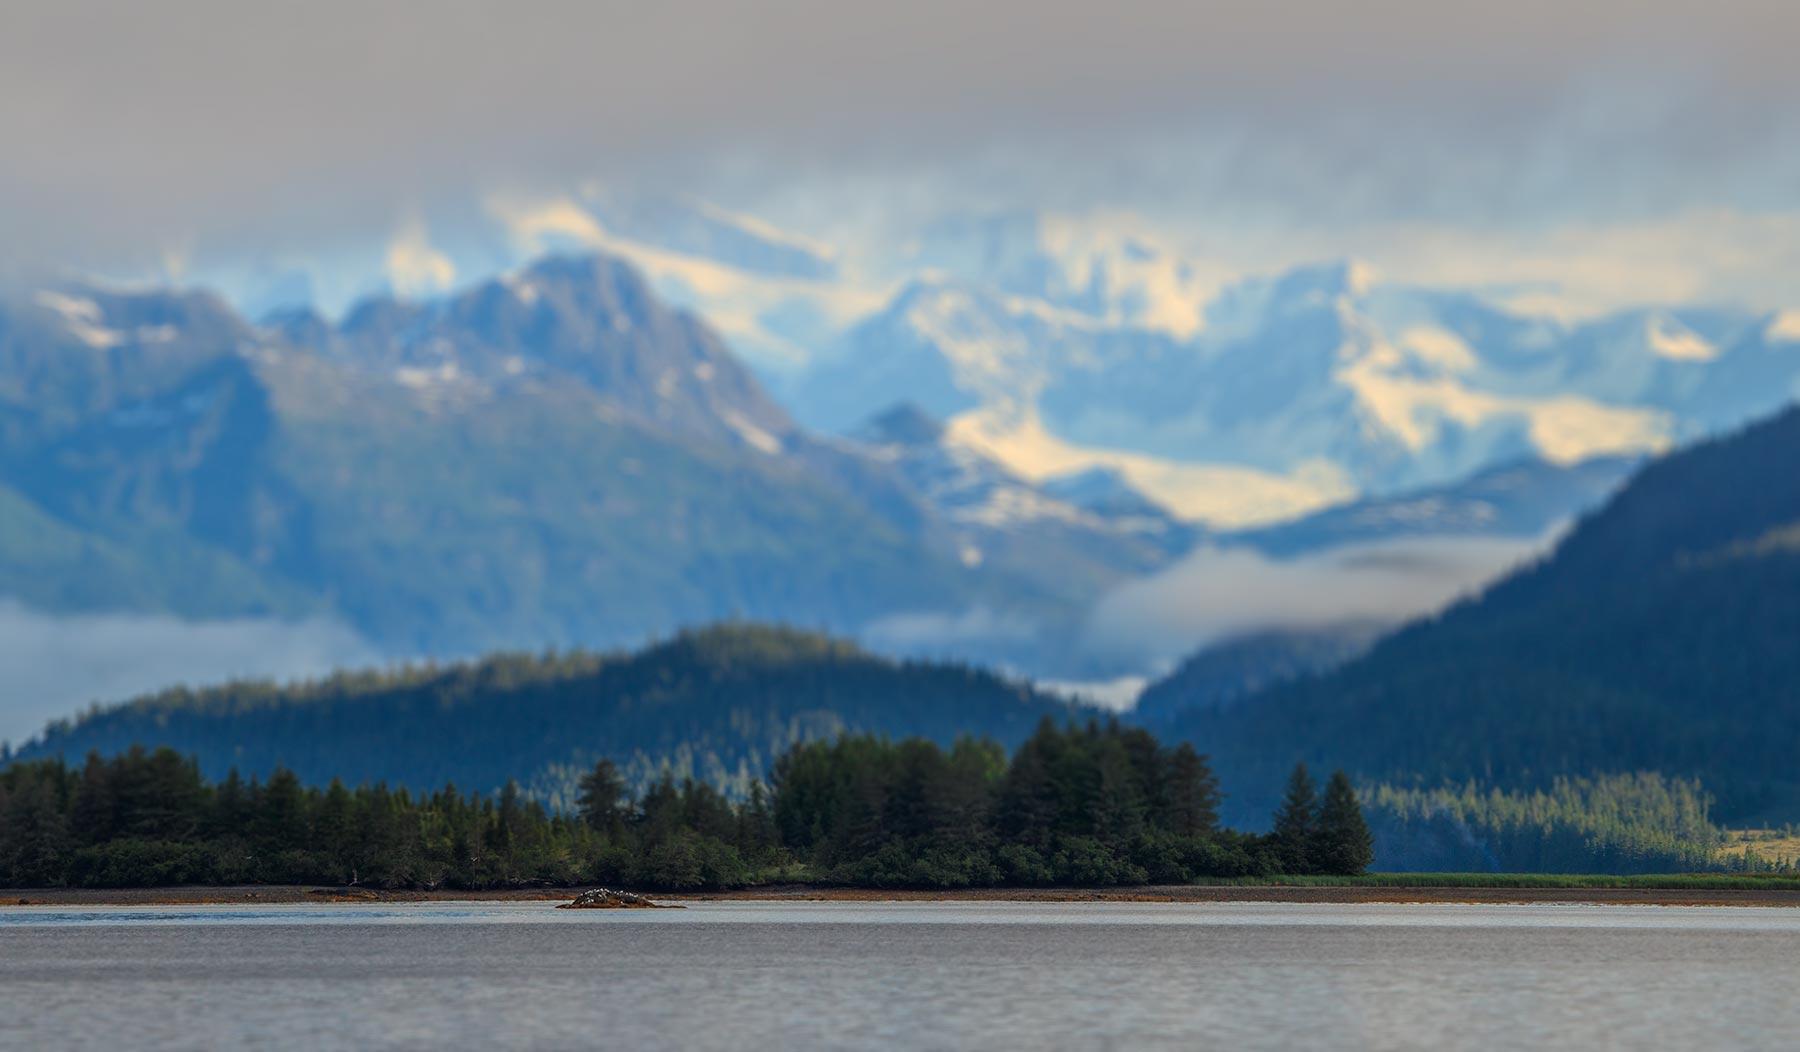 AlaskaPhotography Tours Stock Photos Prints Aerial Drone